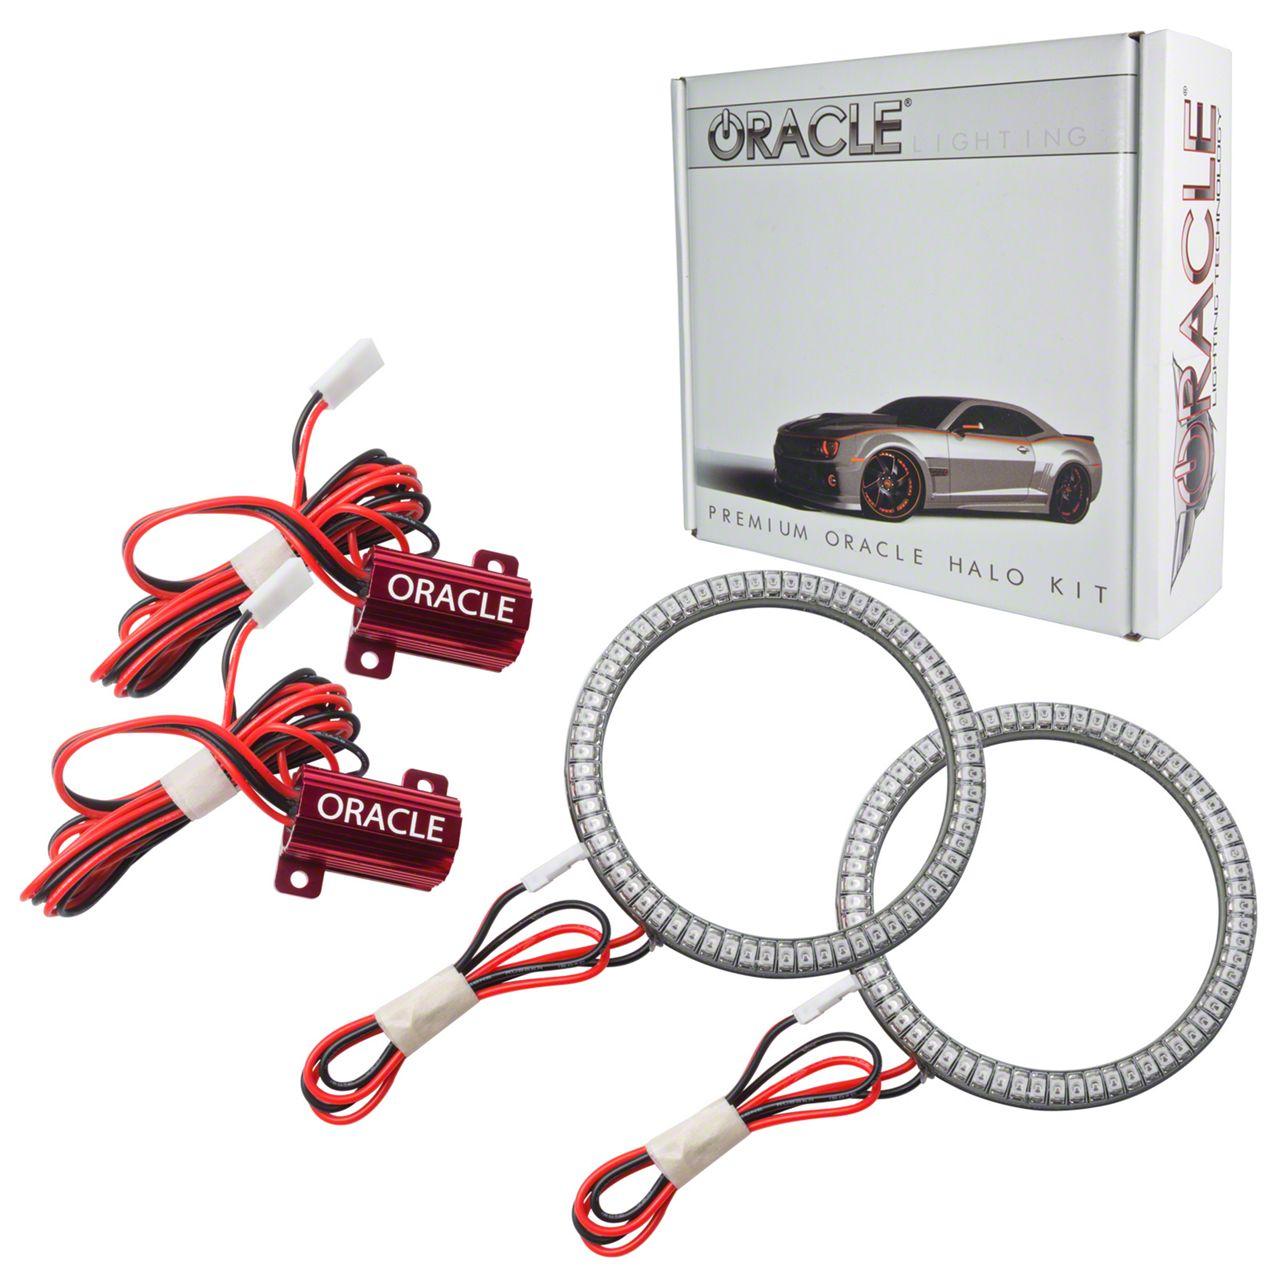 Oracle LED Waterproof Fog Light Halo Conversion Kit - Green (07-18 Jeep Wrangler JK)